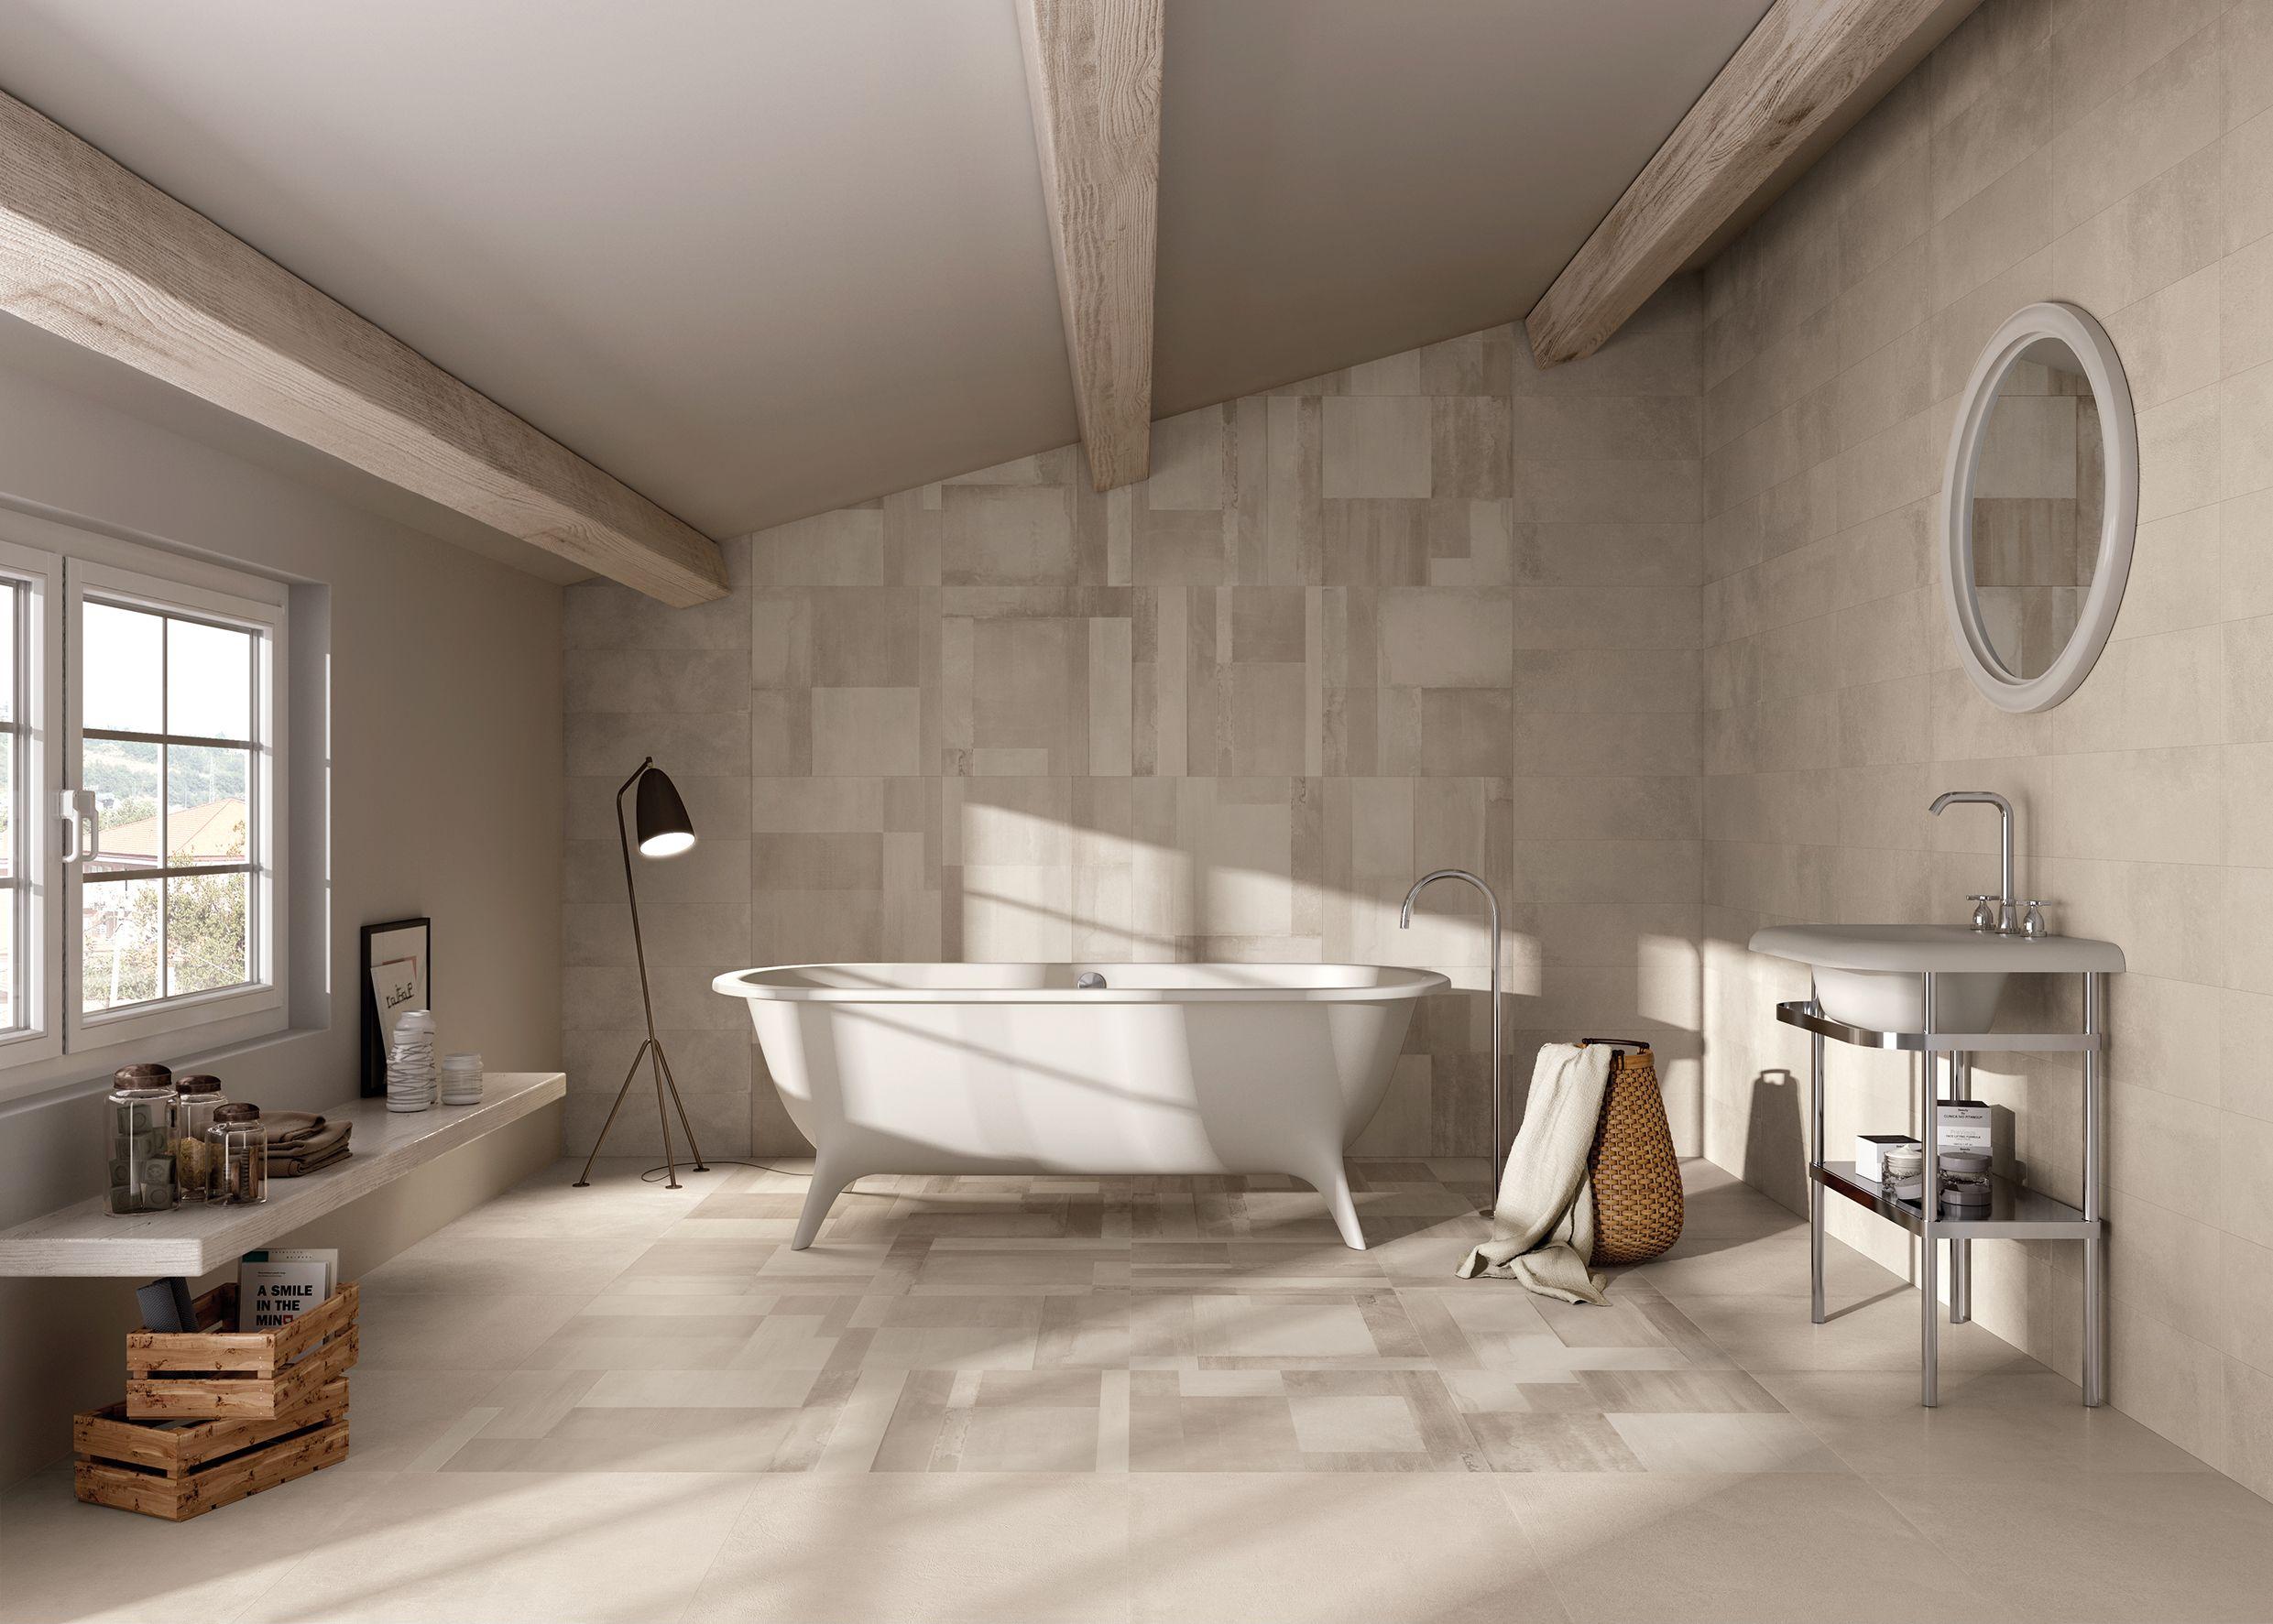 Bagno con piastrelle in gres porcellanato effetto cemento - Bagno gres porcellanato ...